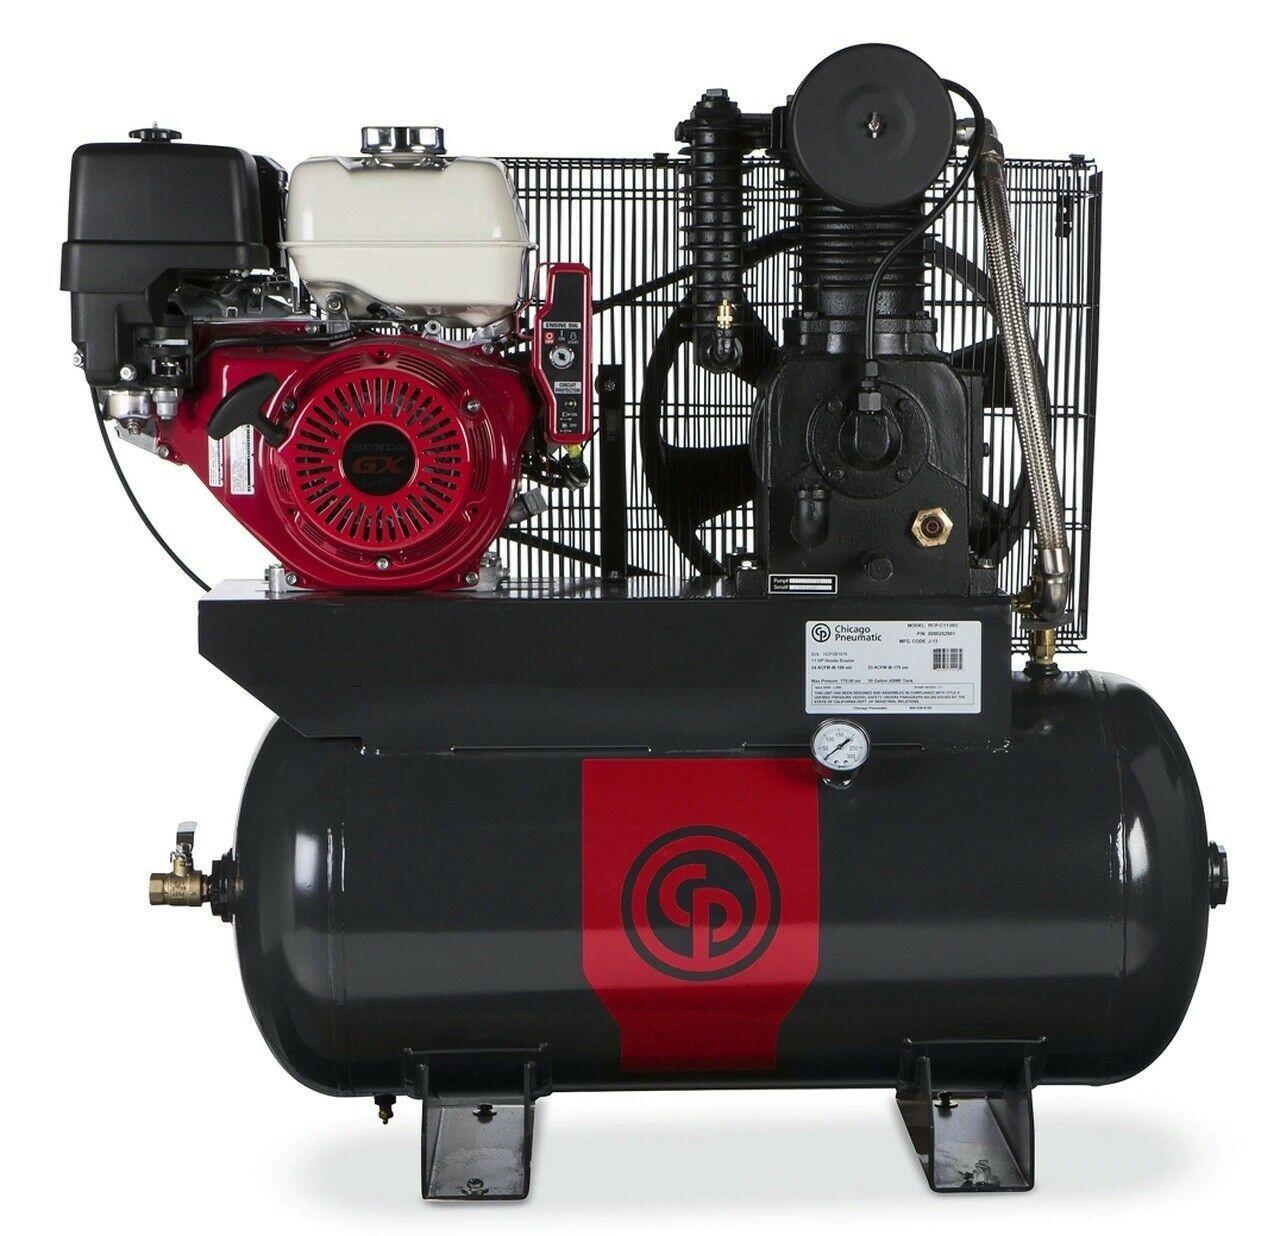 CP RCP-C1130G 11Hp Honda Gas 30 Gallon 2Stage 18.5CFM Truck Mount Air Compressor - $2,920.50